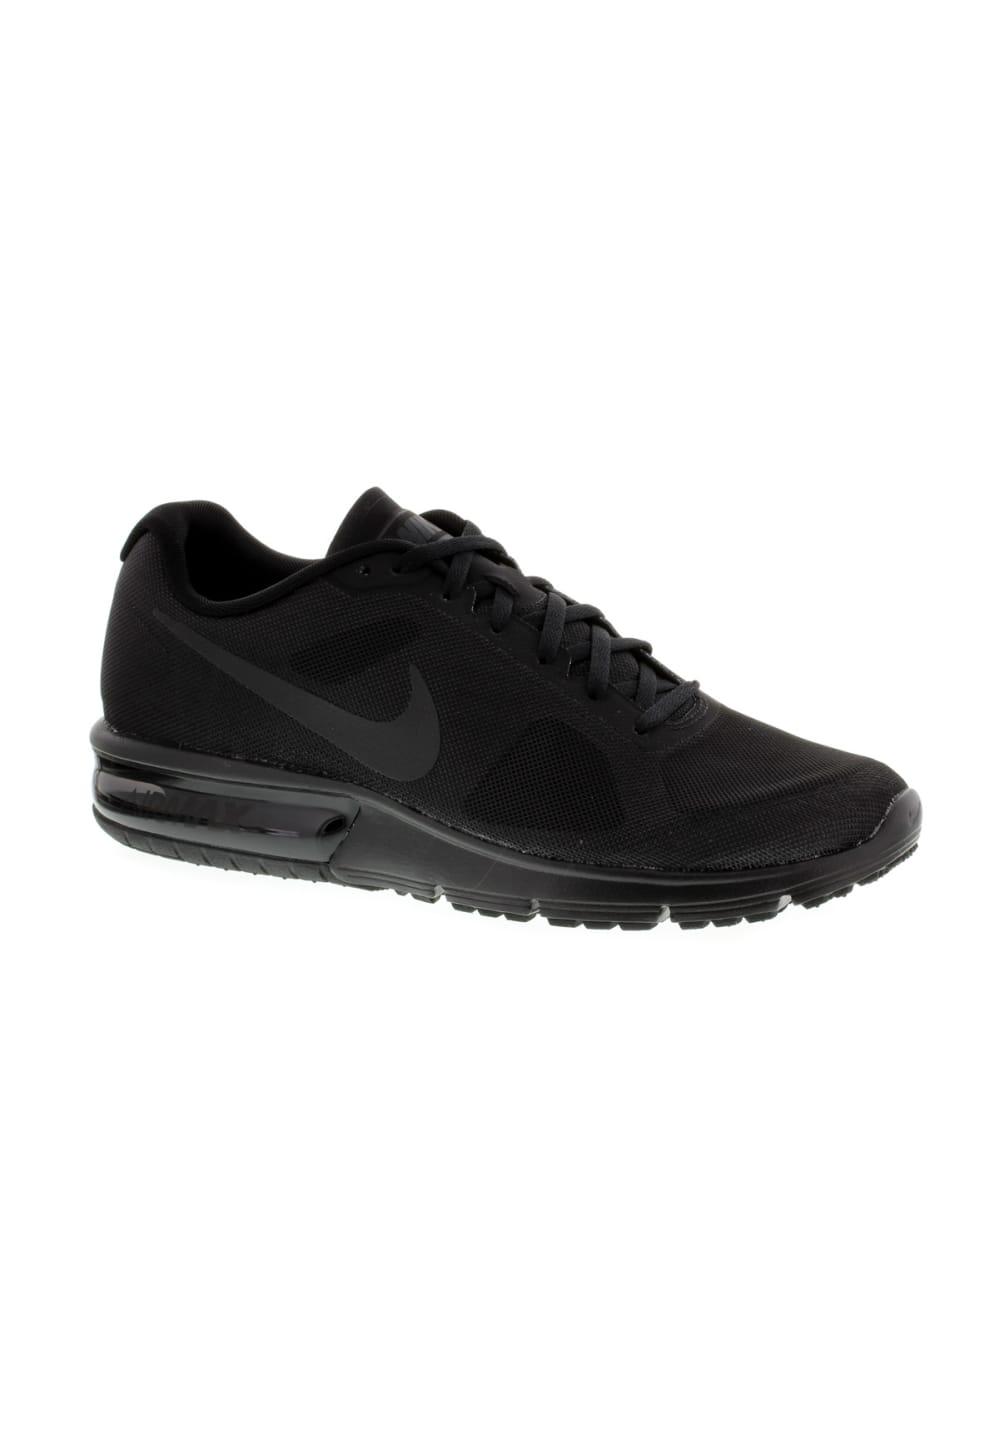 06453473e9 Nike Air Max Sequent - Running shoes for Men - Black   21RUN